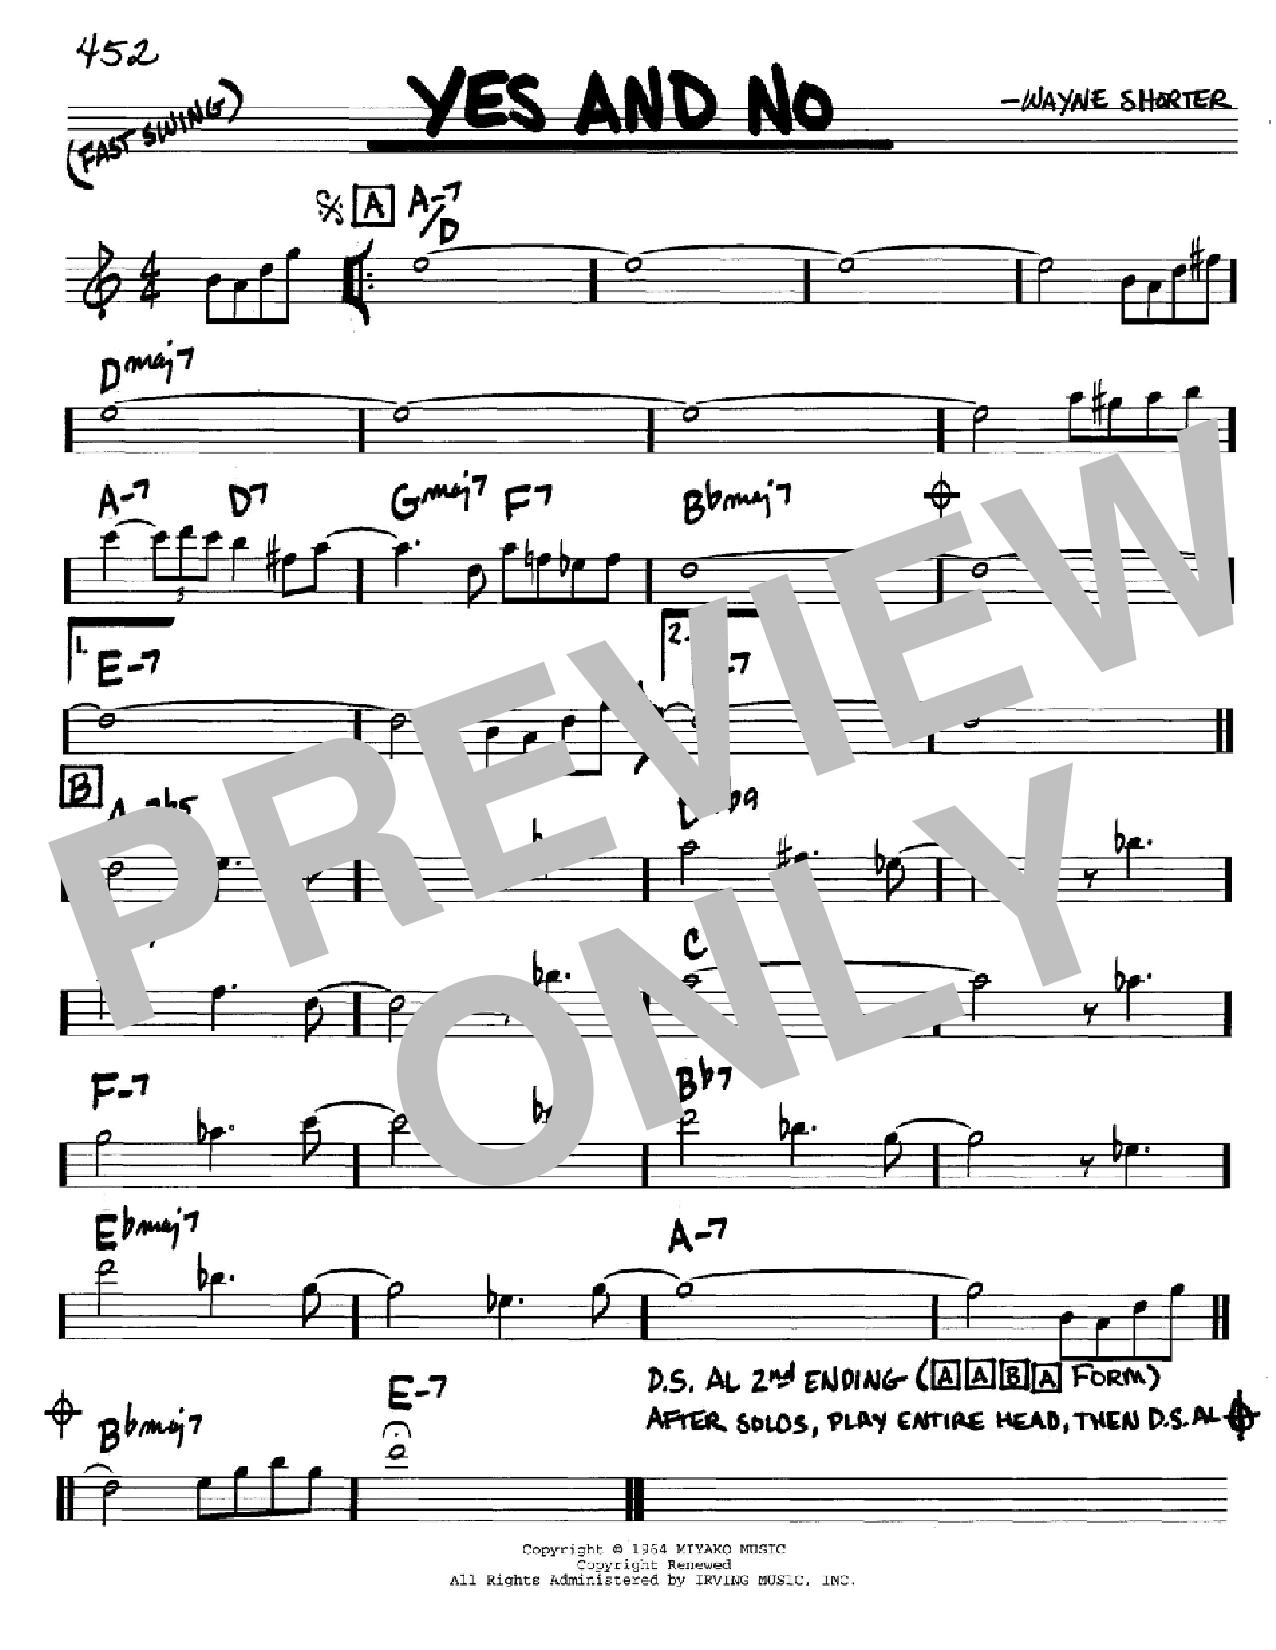 Partition autre Yes And No de Wayne Shorter - Real Book, Melodie et Accords, Inst. En Do